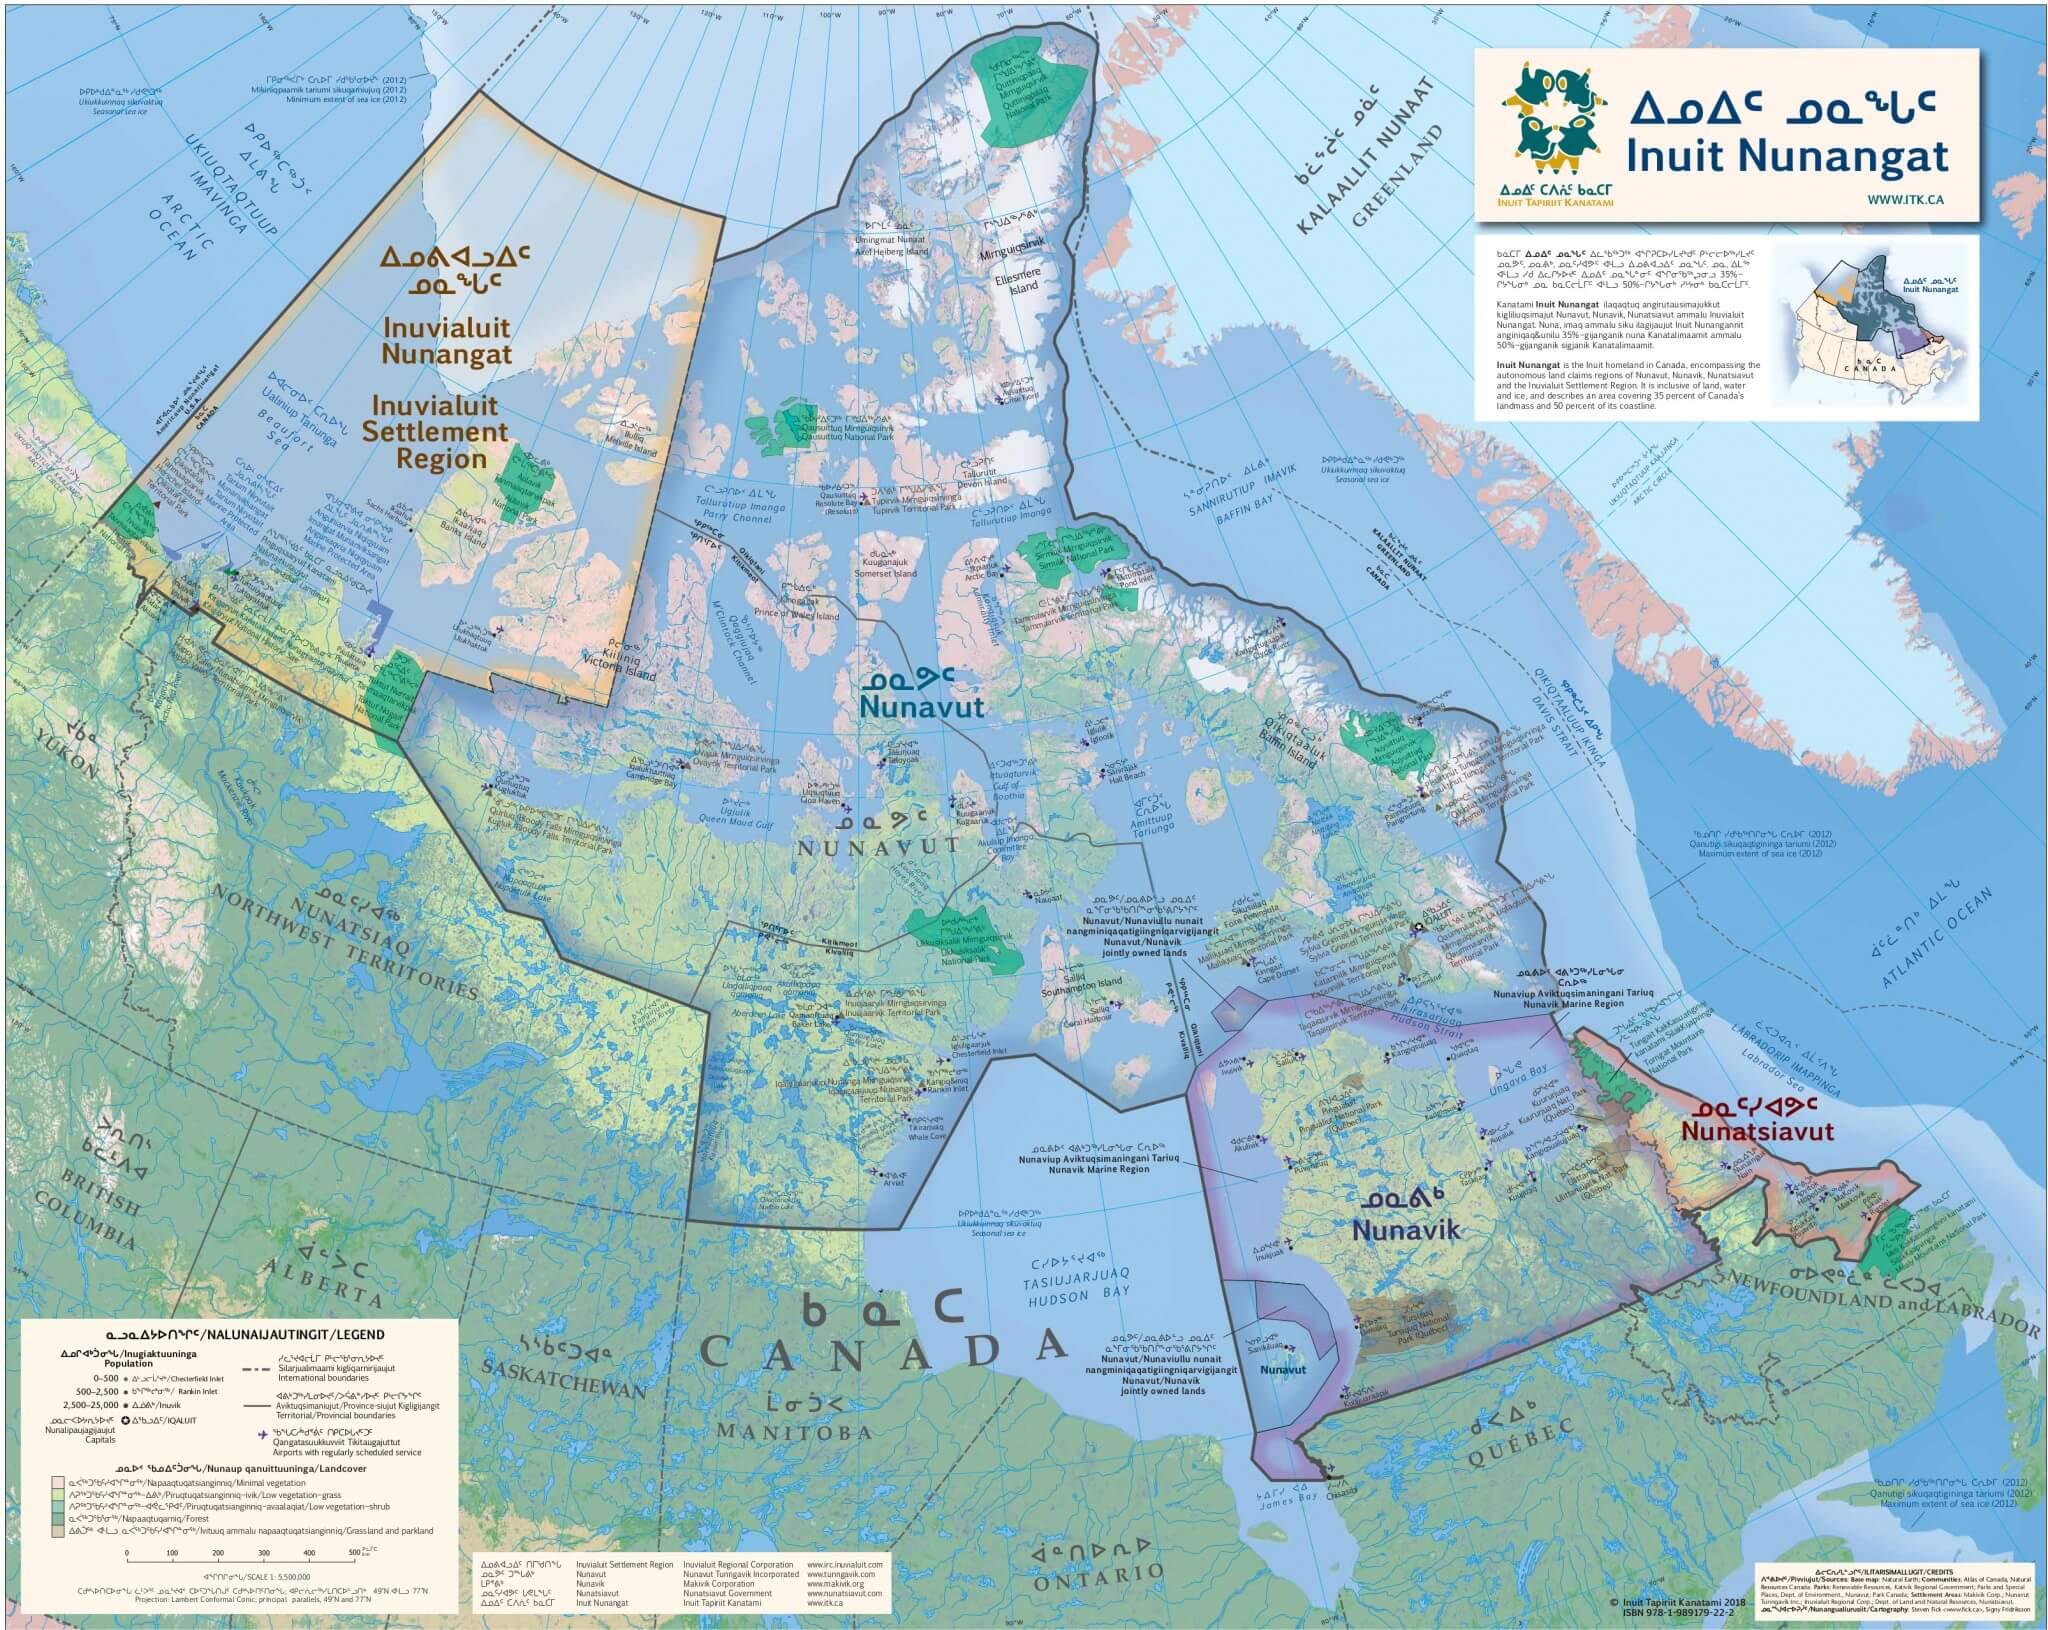 Inuit Canada Map Inuit Nunangat Map — Inuit Tapiriit Kanatami